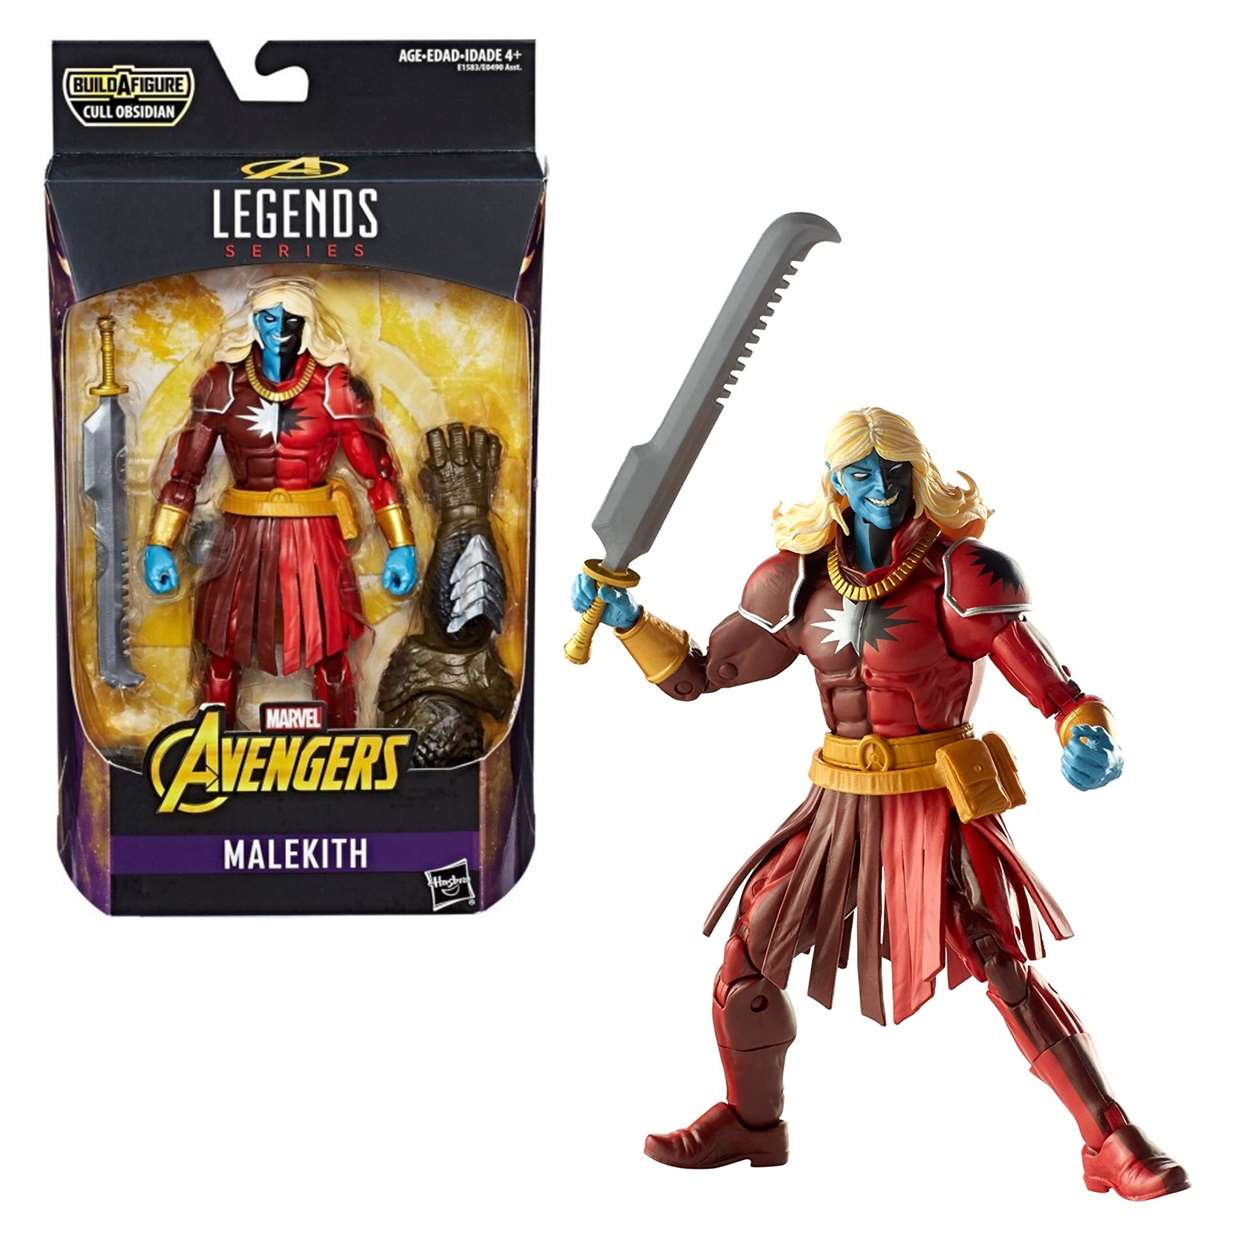 Malekith Figura Marvel B A F Cull Obsidian Legends 6 Pulg